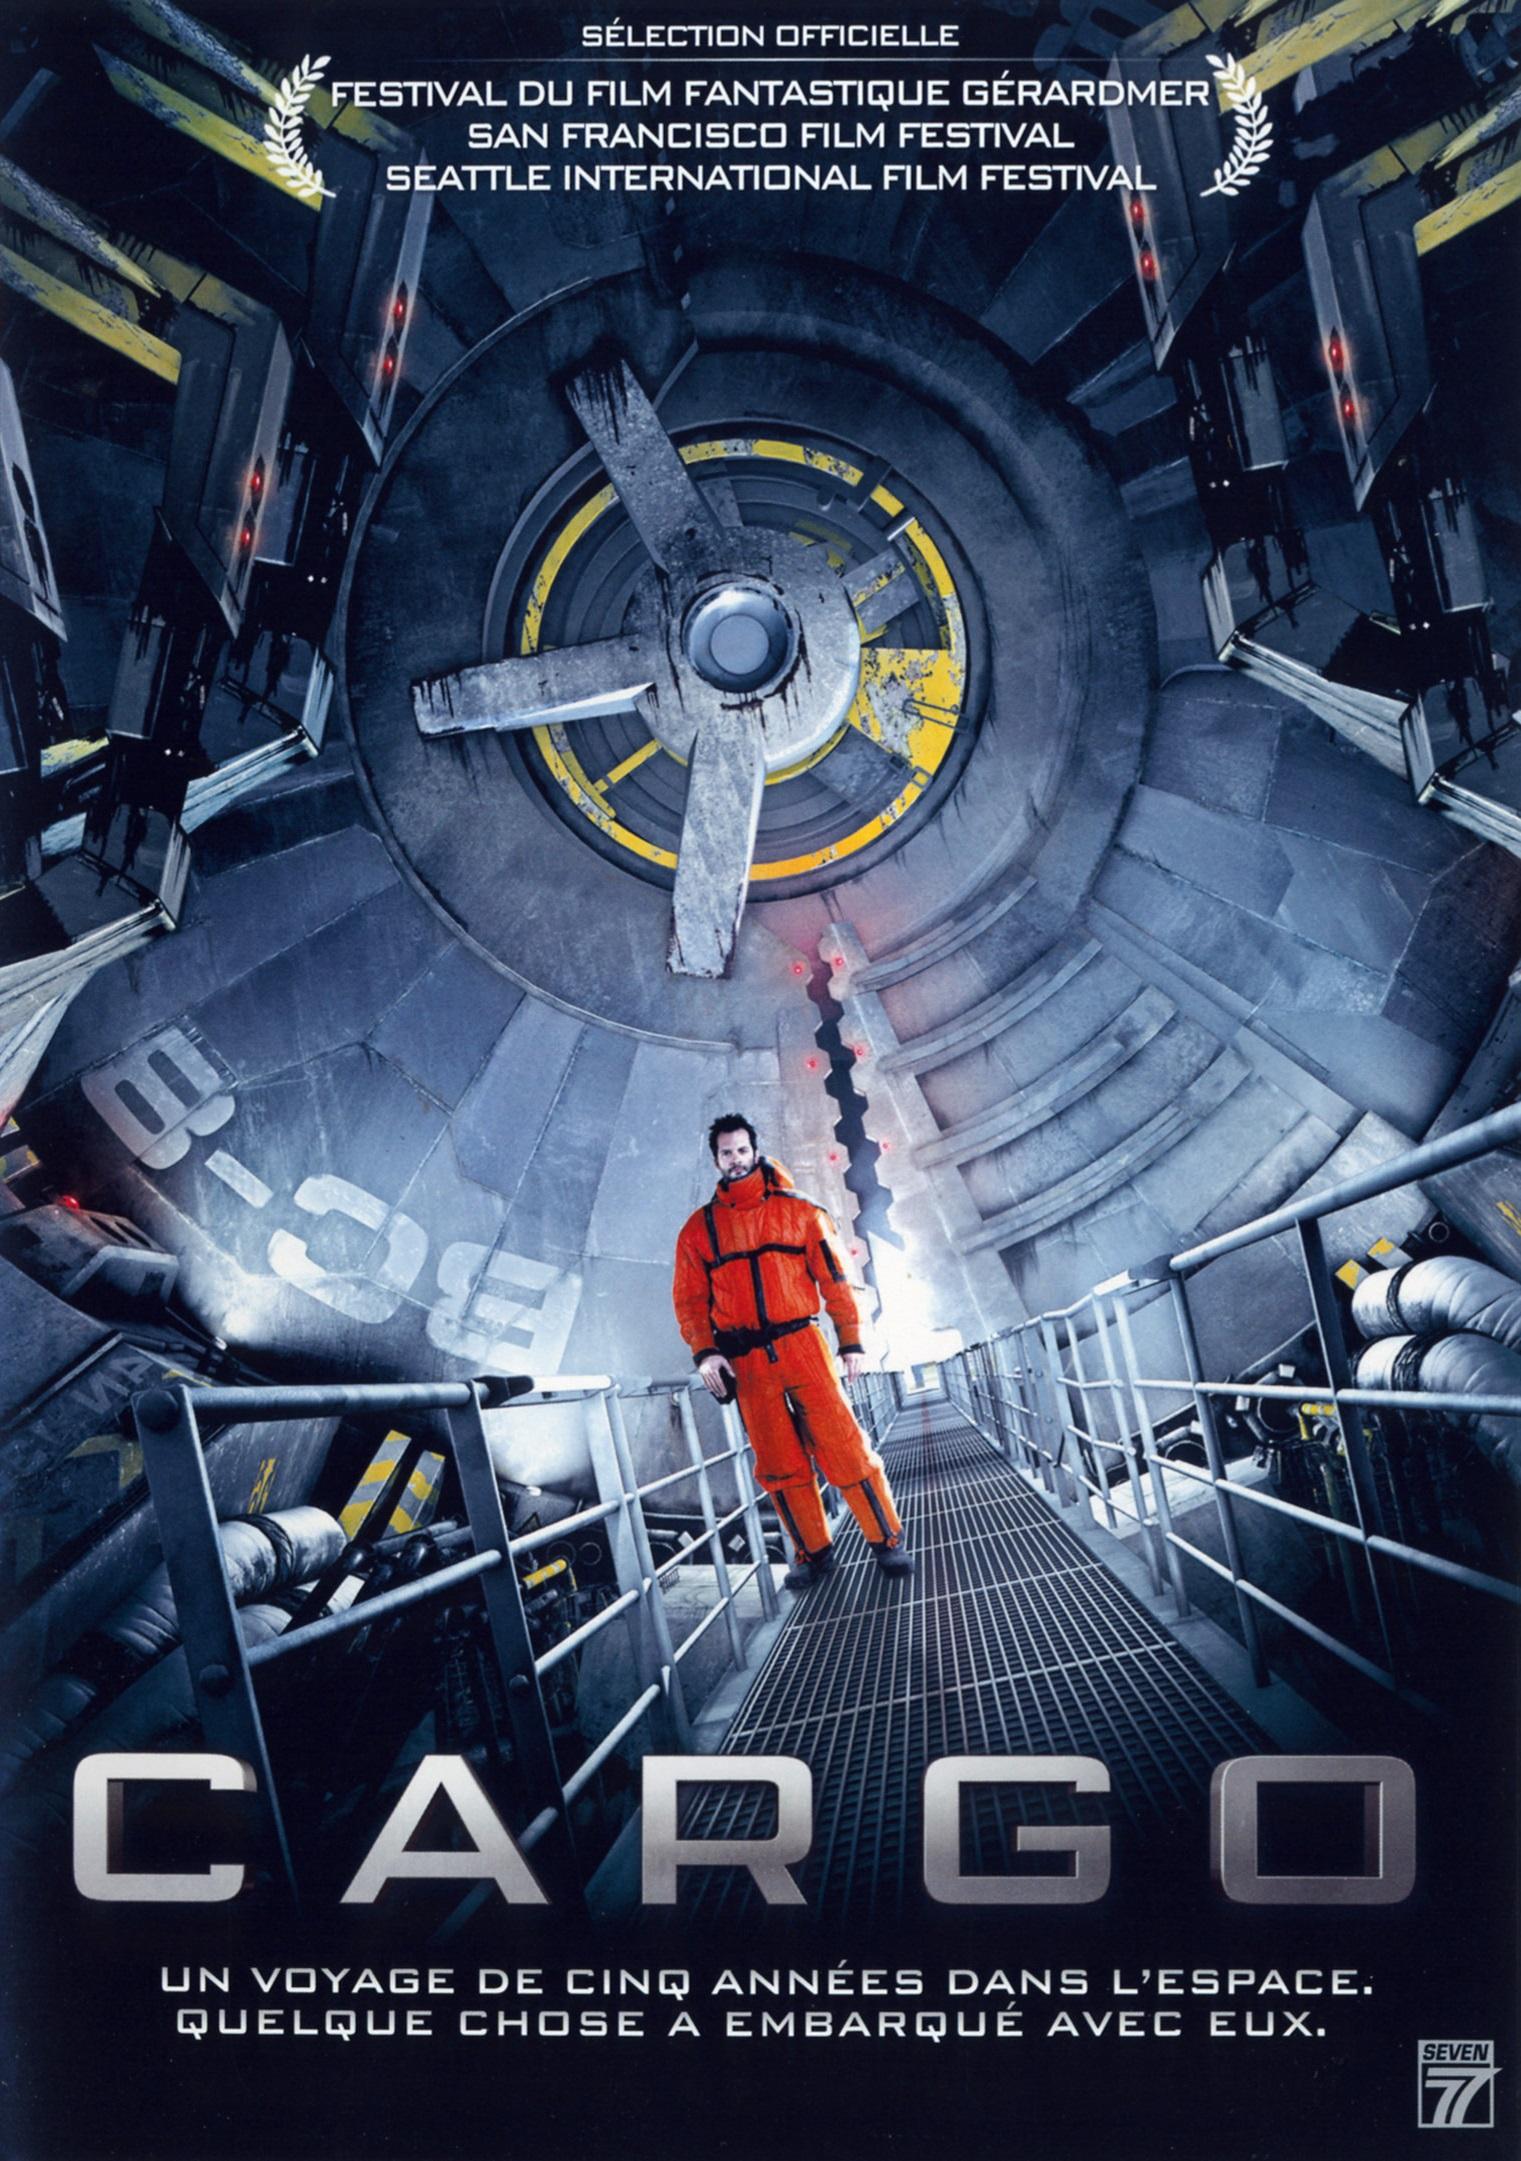 Cargo / Карго (2009)